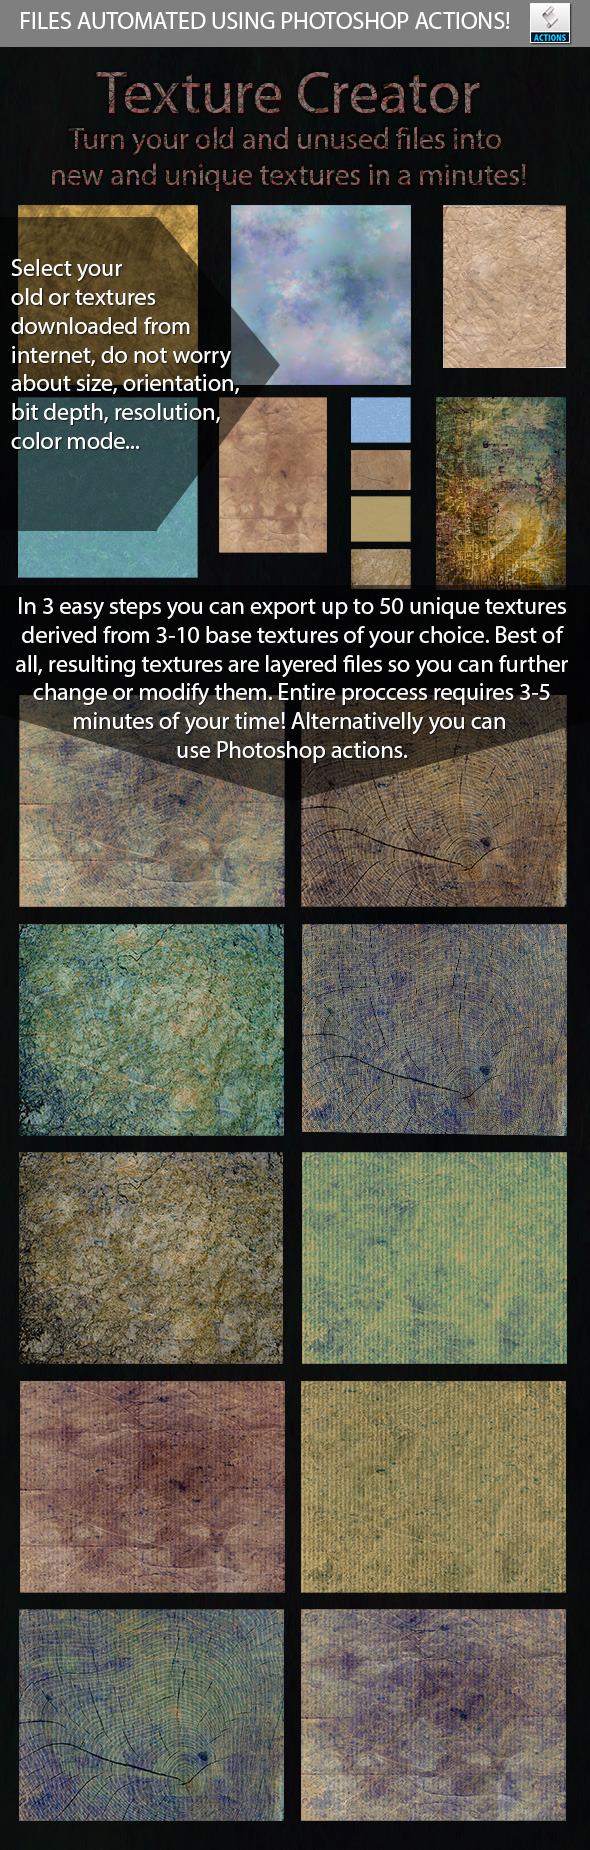 Automated Texture Creator